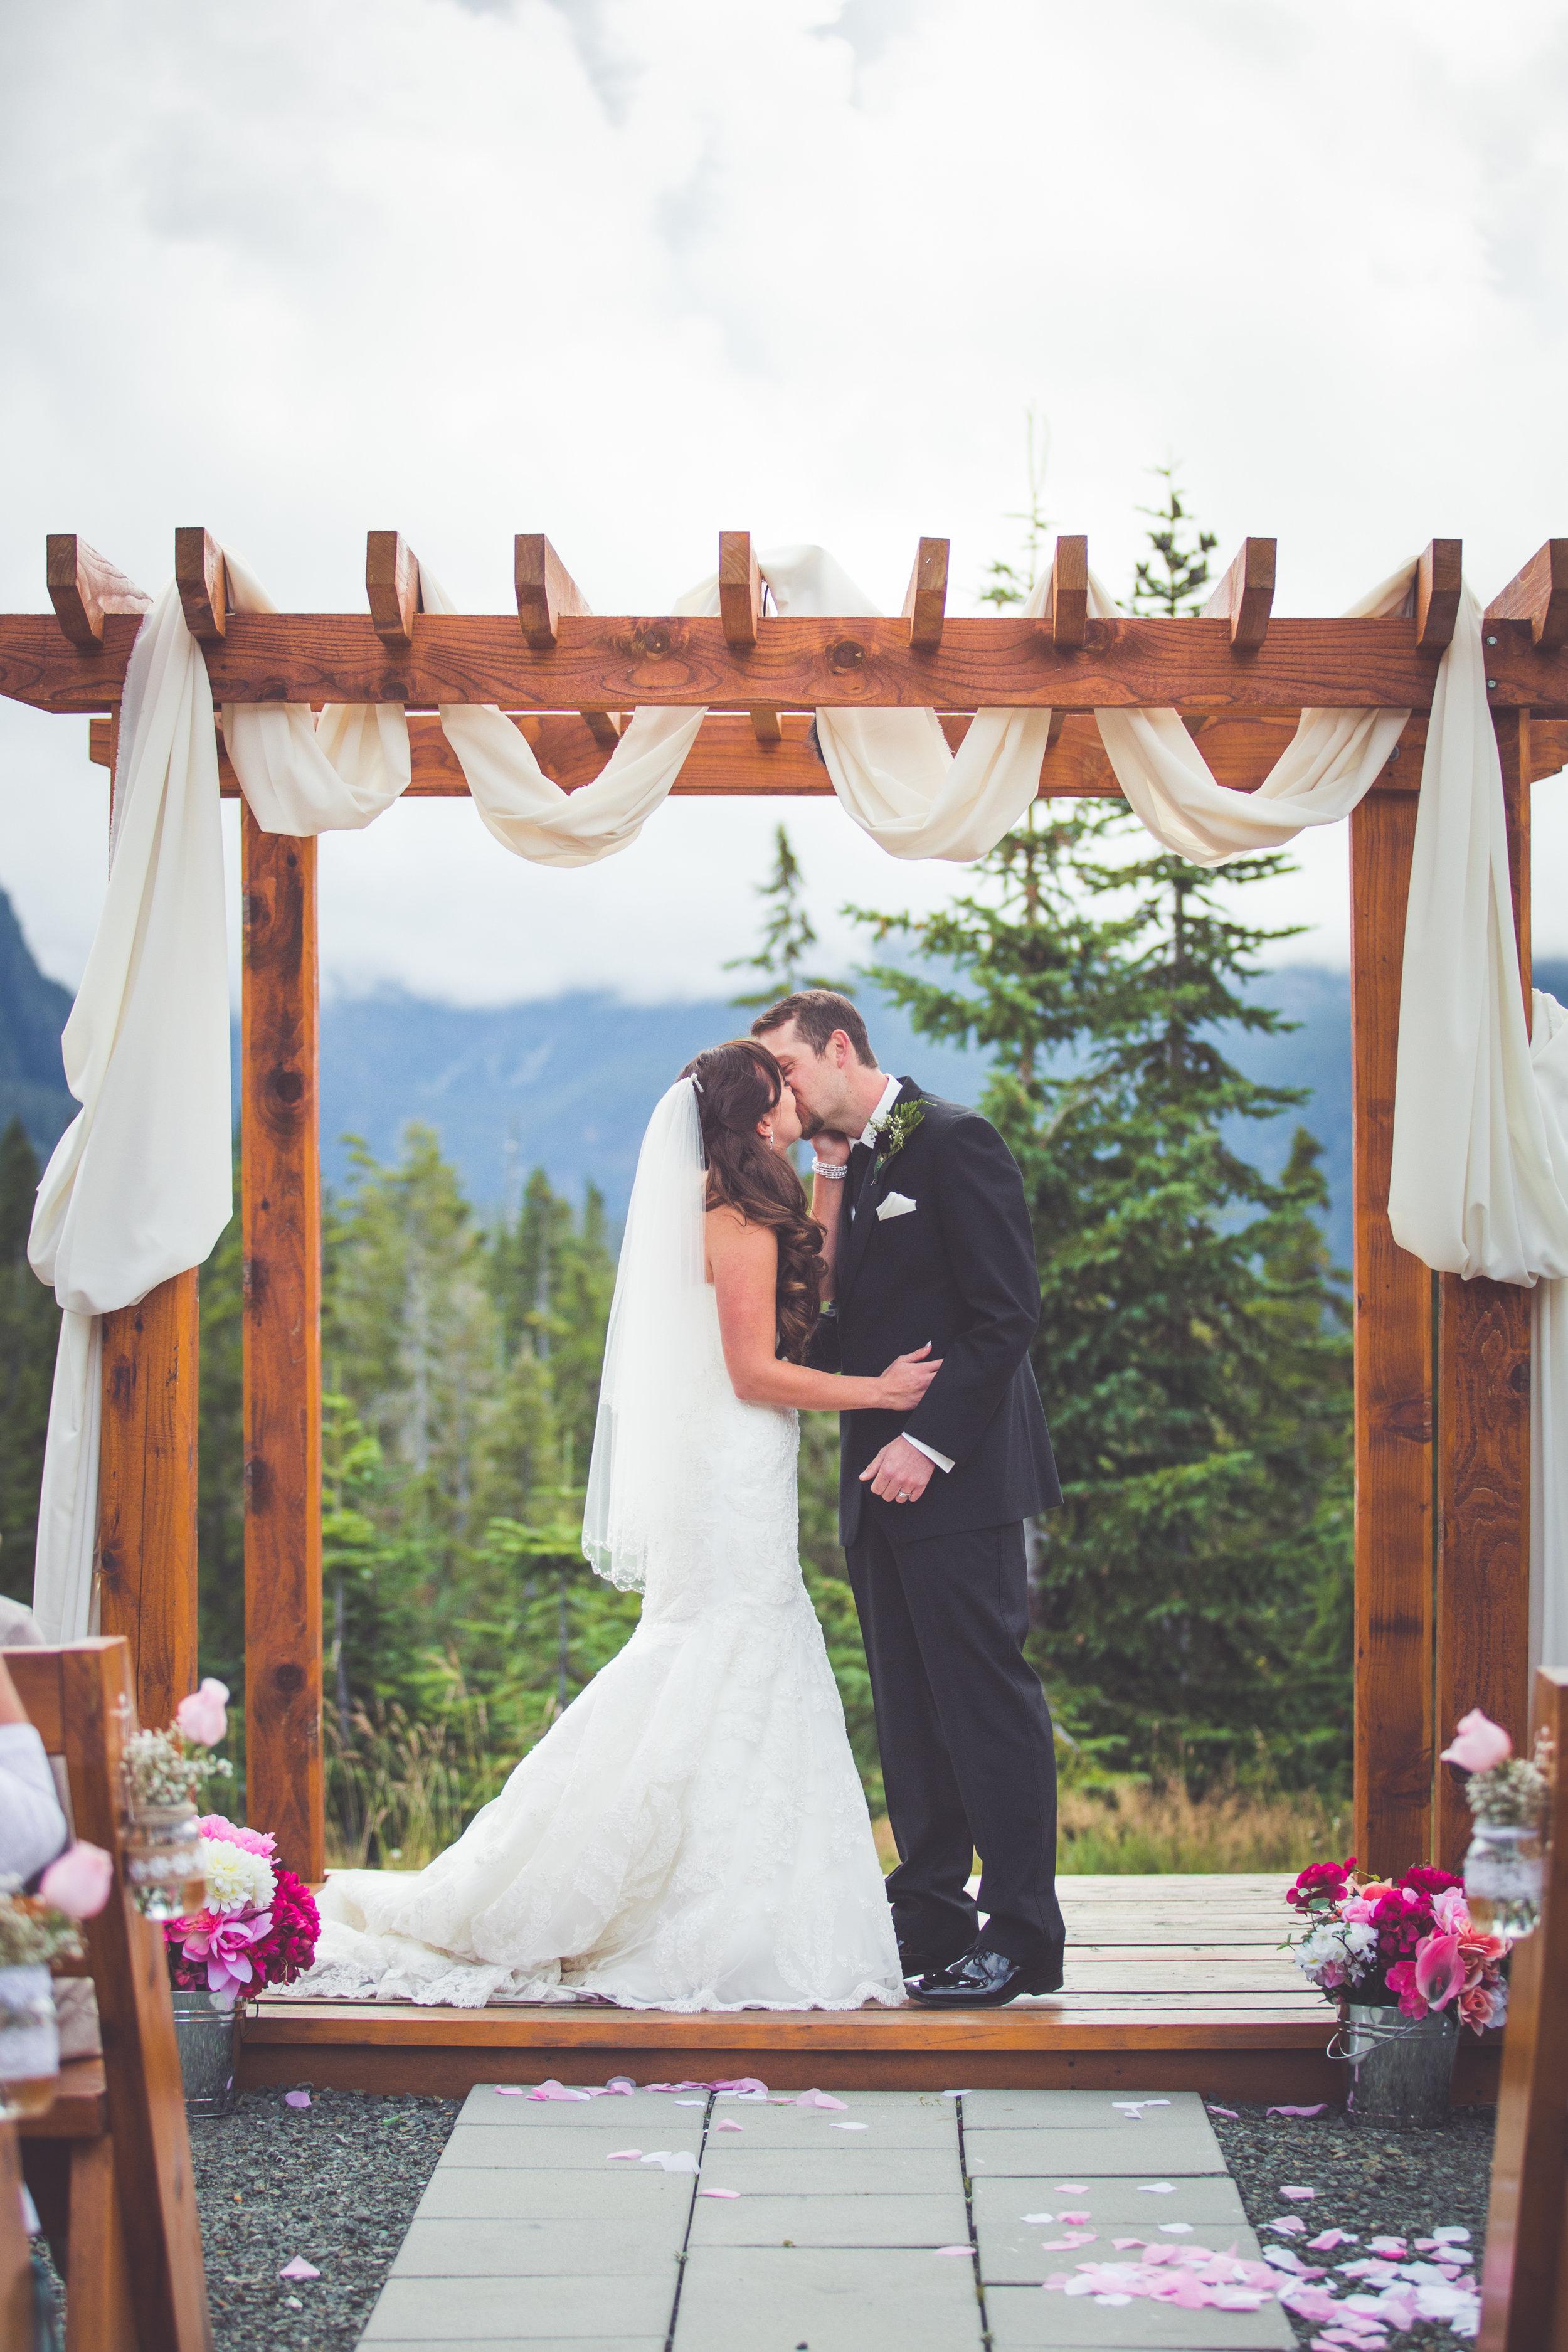 bride and groom kiss at mount washington resort wedding